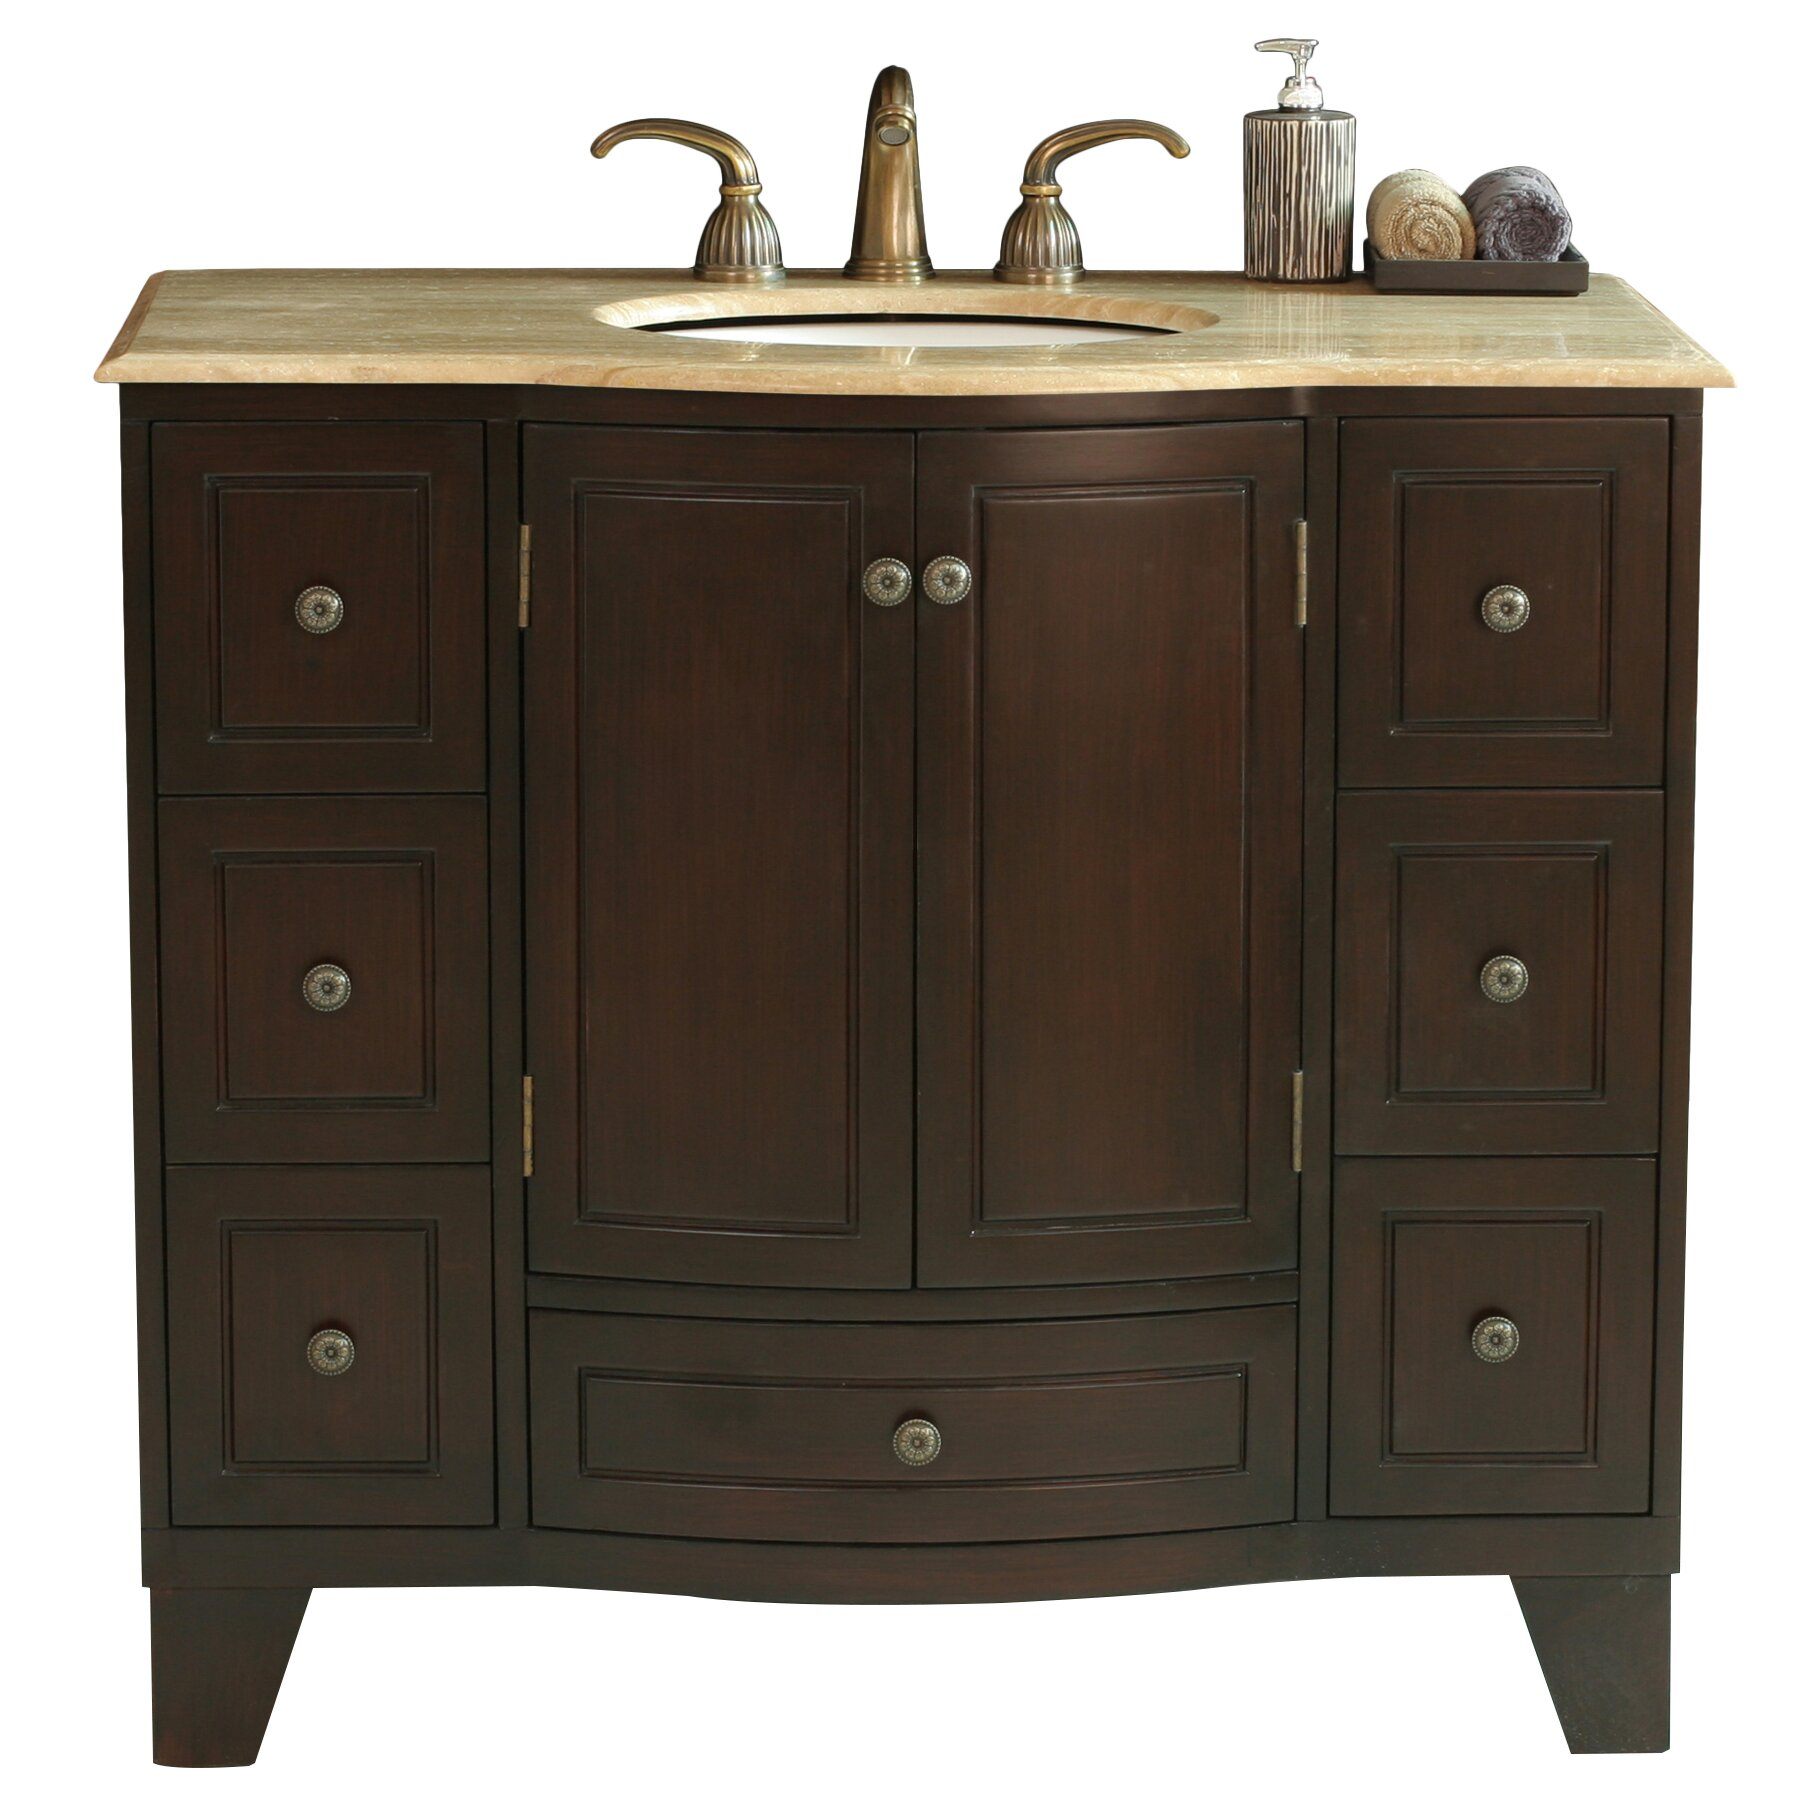 singles in lindenwood Delta faucet linden™ single lever handle vessel lavatory faucet d794dst delta faucet linden™ 2 gpm single lever handle tub and shower trim (trim only.